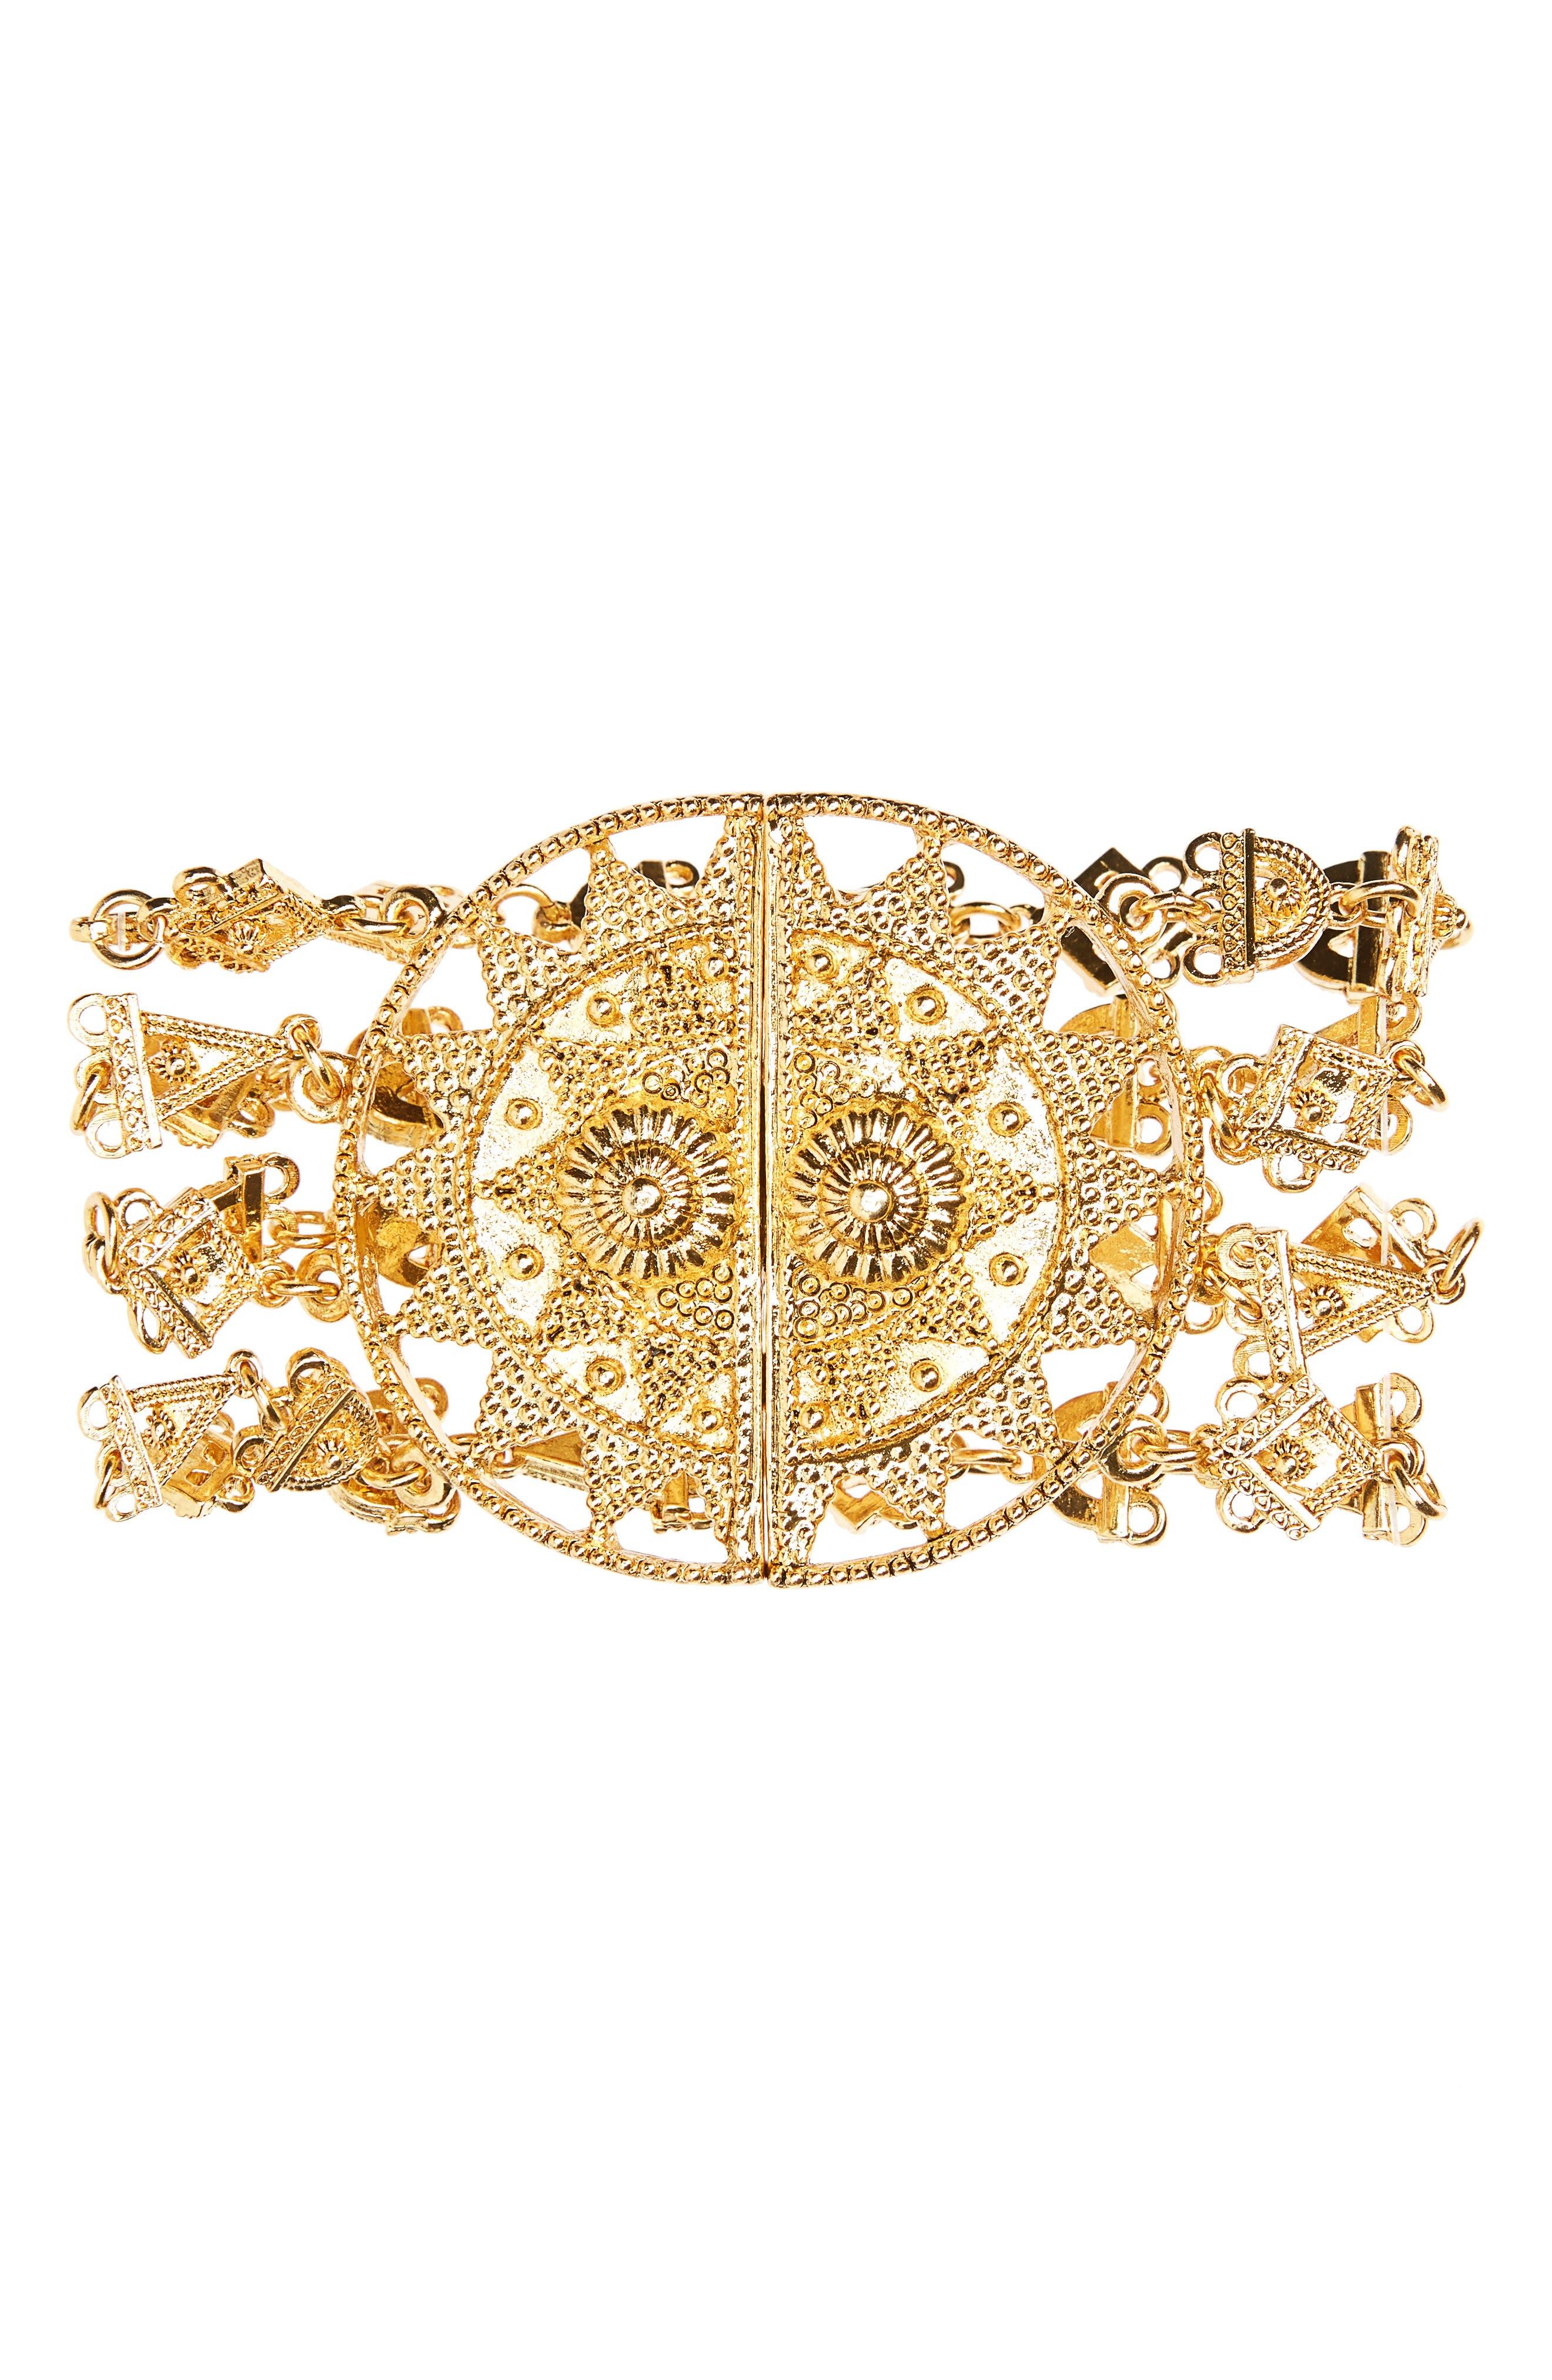 Alternate Image 1 Selected - Oscar de la Renta Charm Bracelet